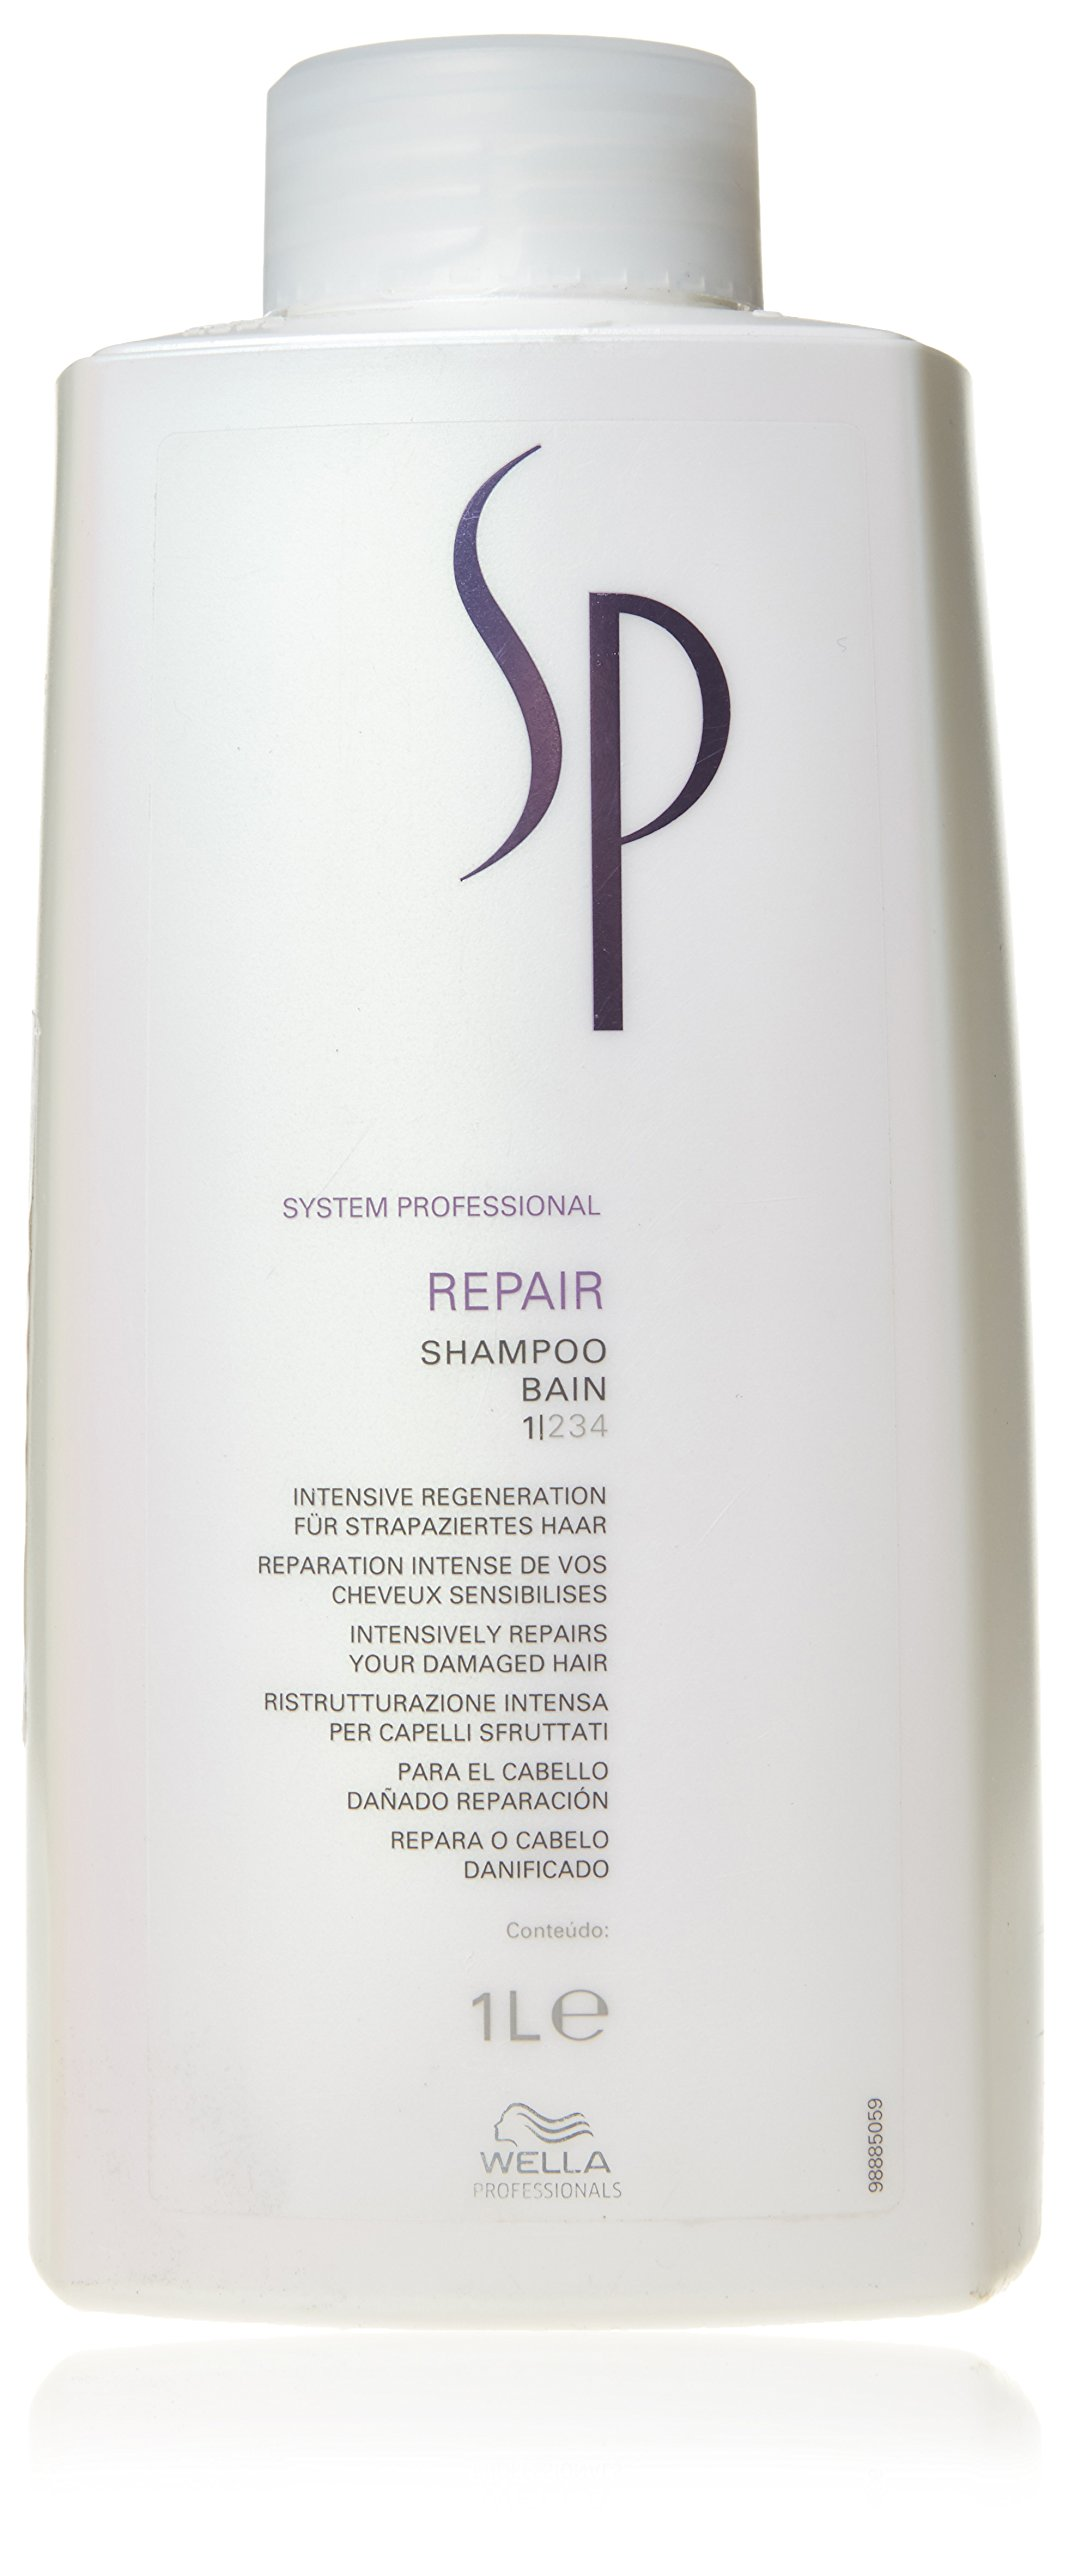 Wella Sp Repair Shampoo for Damaged Hair, 33.8 Ounce by Wella